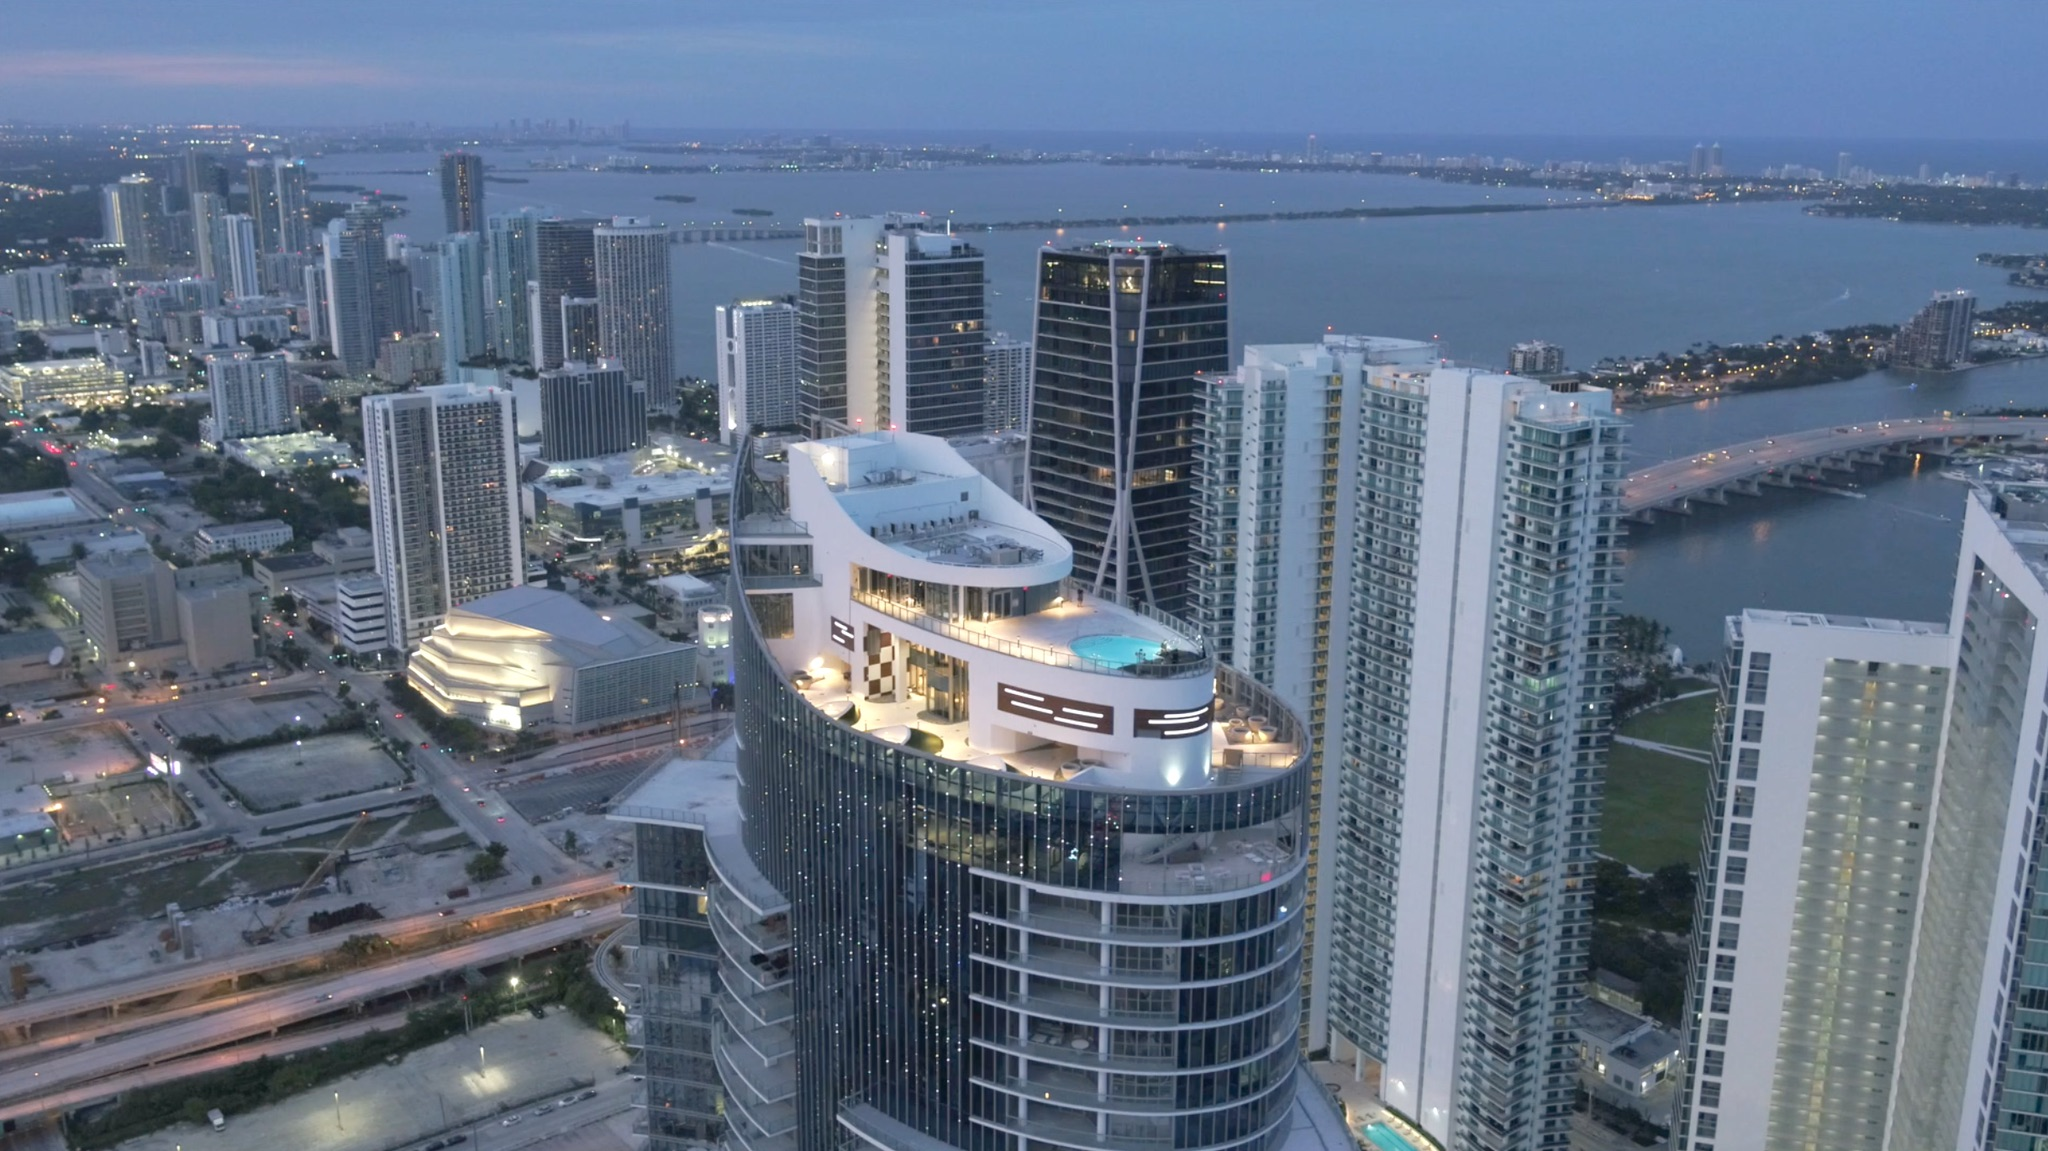 PARAMOUNT Miami Worldcenter - Cedrig Gervais 2